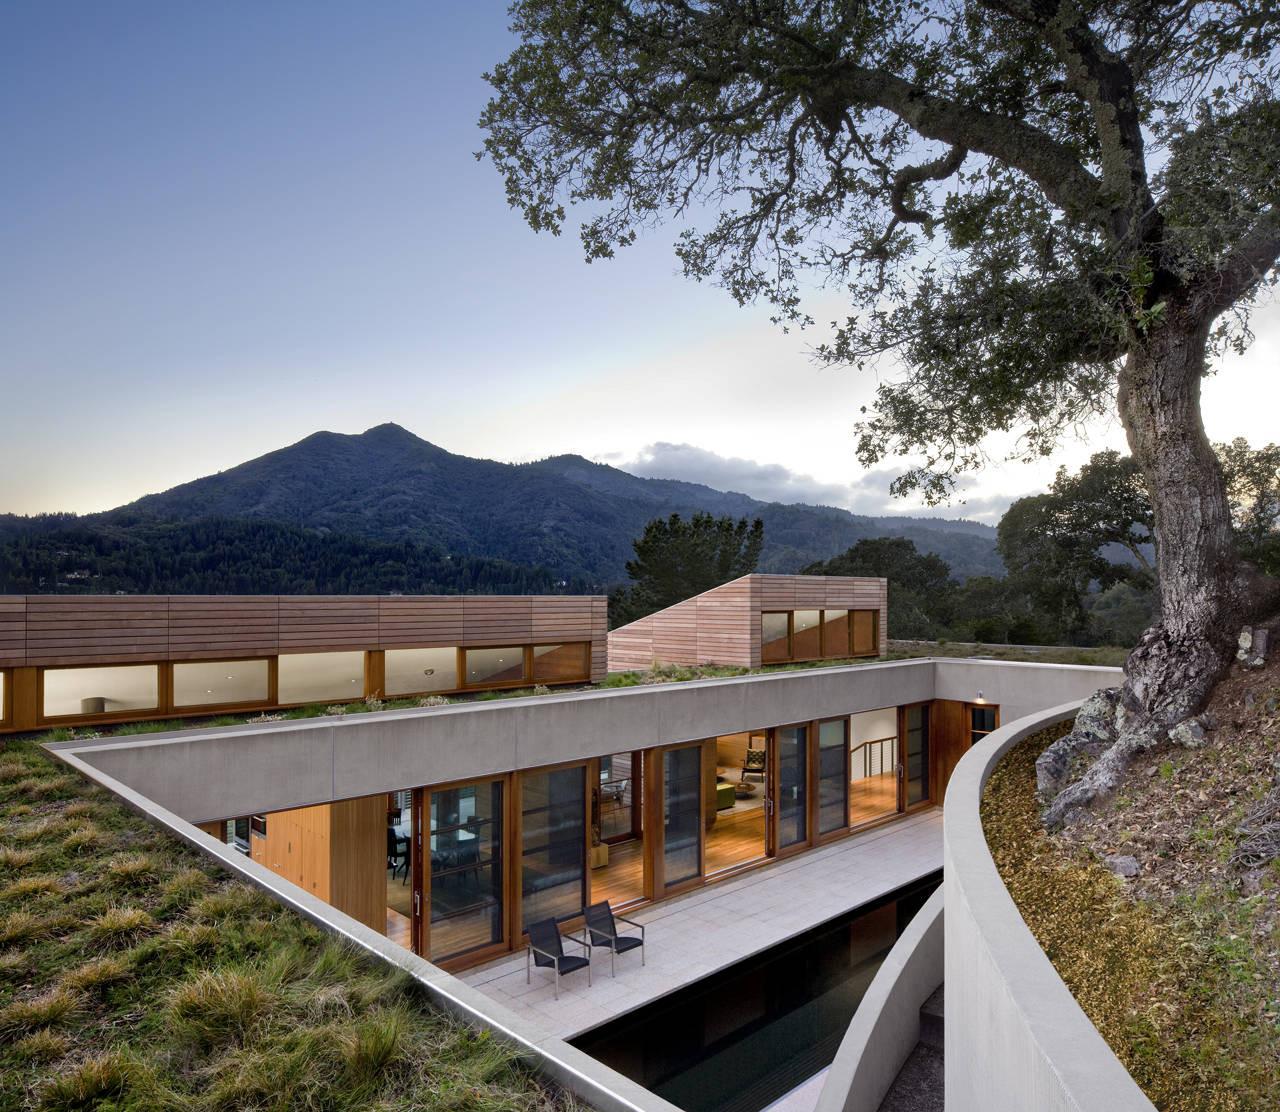 Kentfield Hillside Residence / Turnbull Griffin Haesloop Architects, © David Wakely Photography